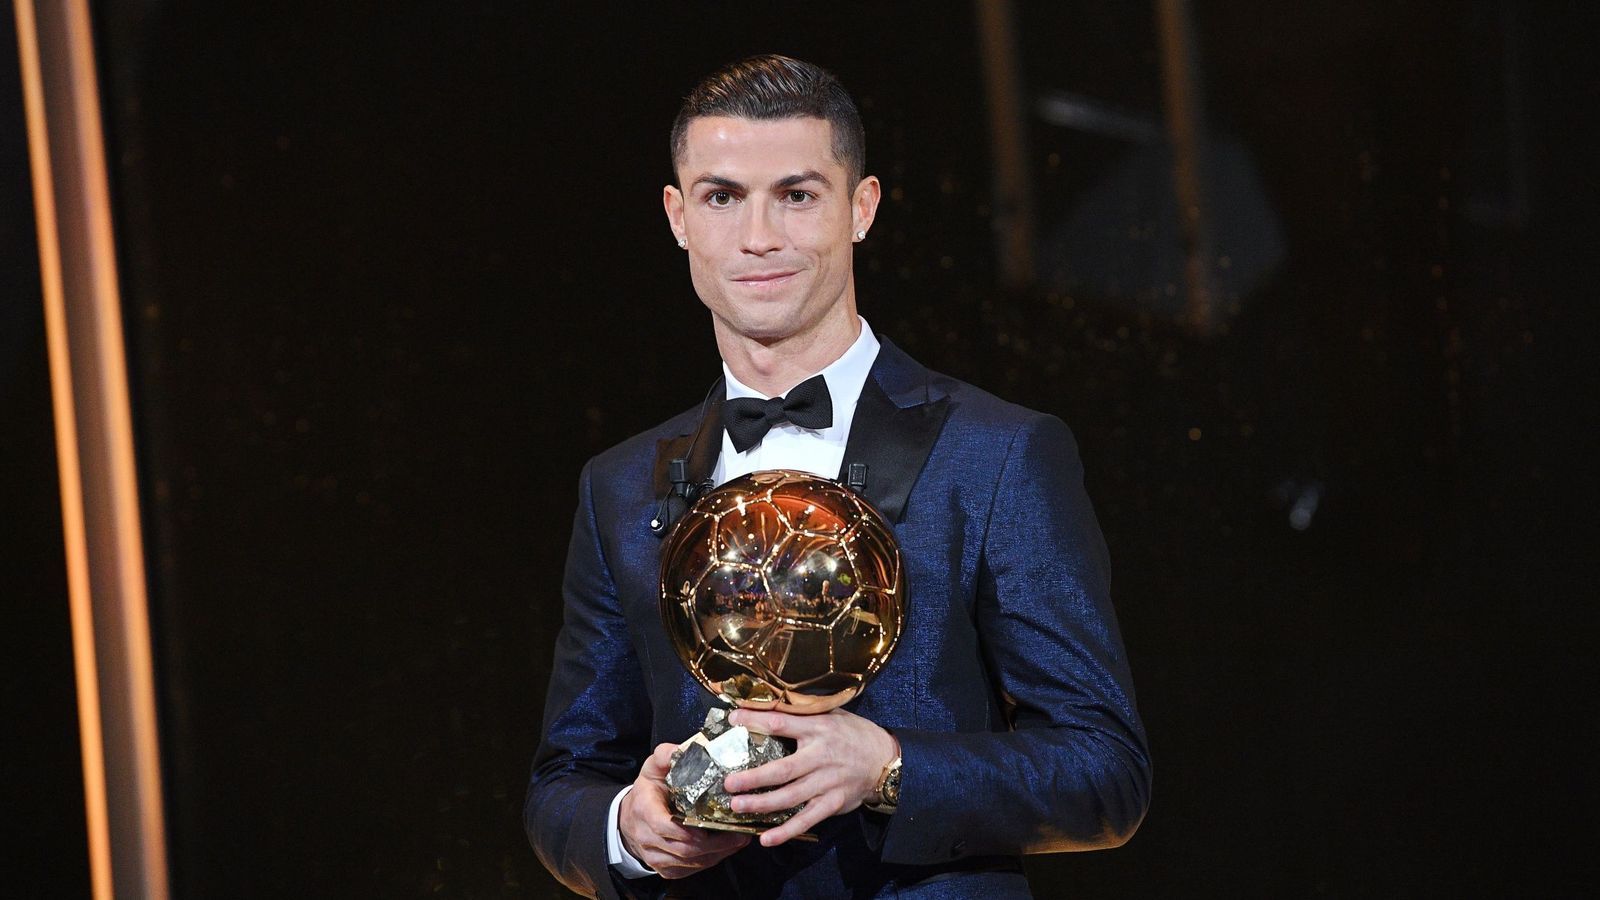 Foto: Cristiano Ronaldo recibe su quinto Balón de Oro. (EFE)